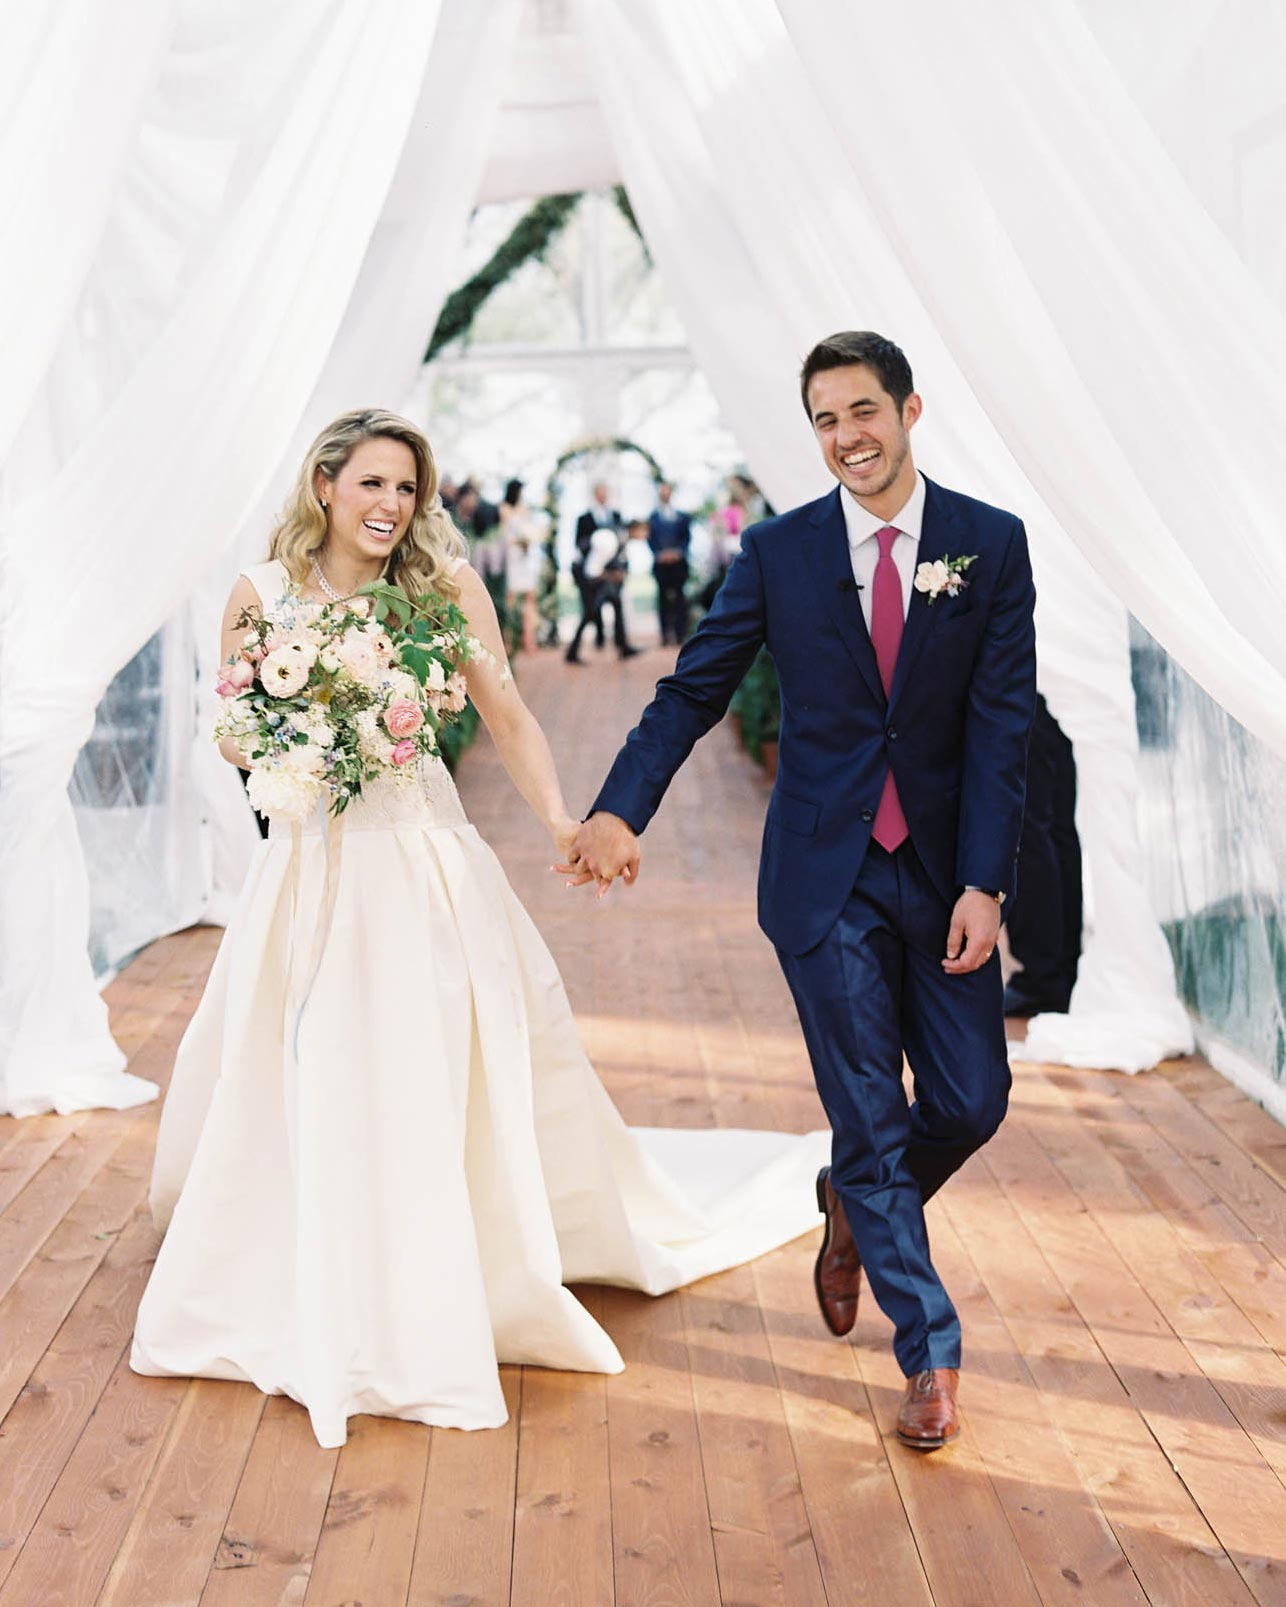 nikki-kiff-wedding-couple-004763009-s112766-0316.jpg